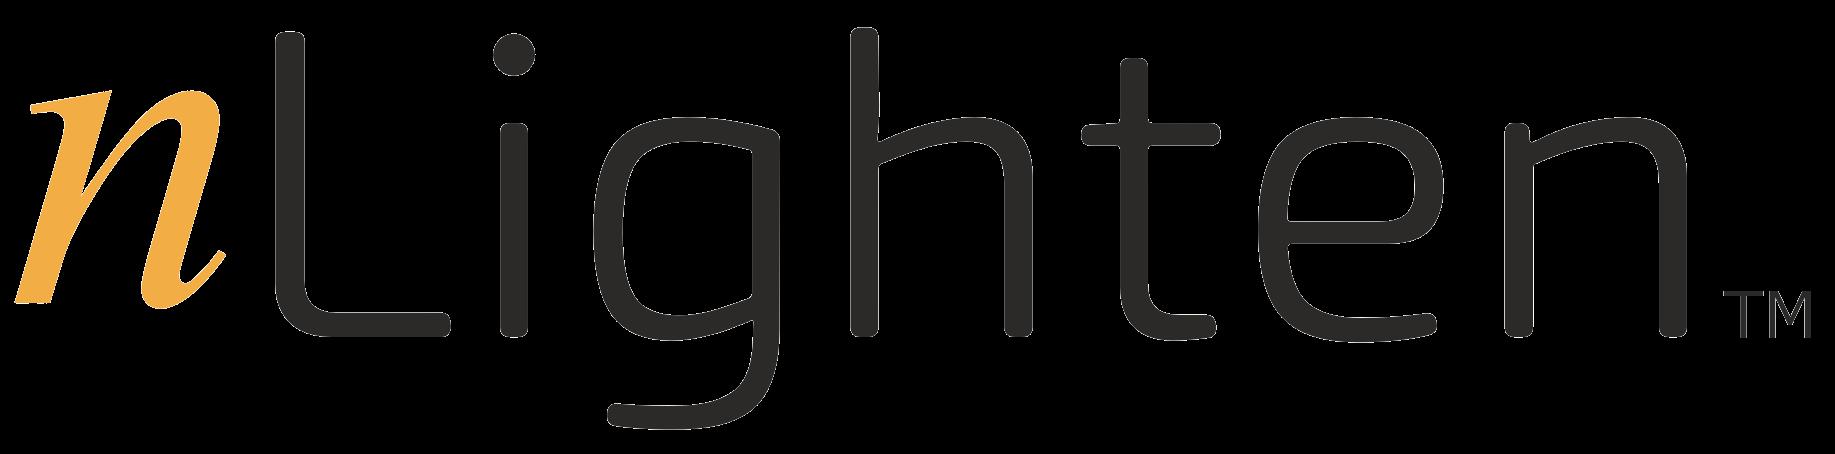 nLighten_logo-transparent